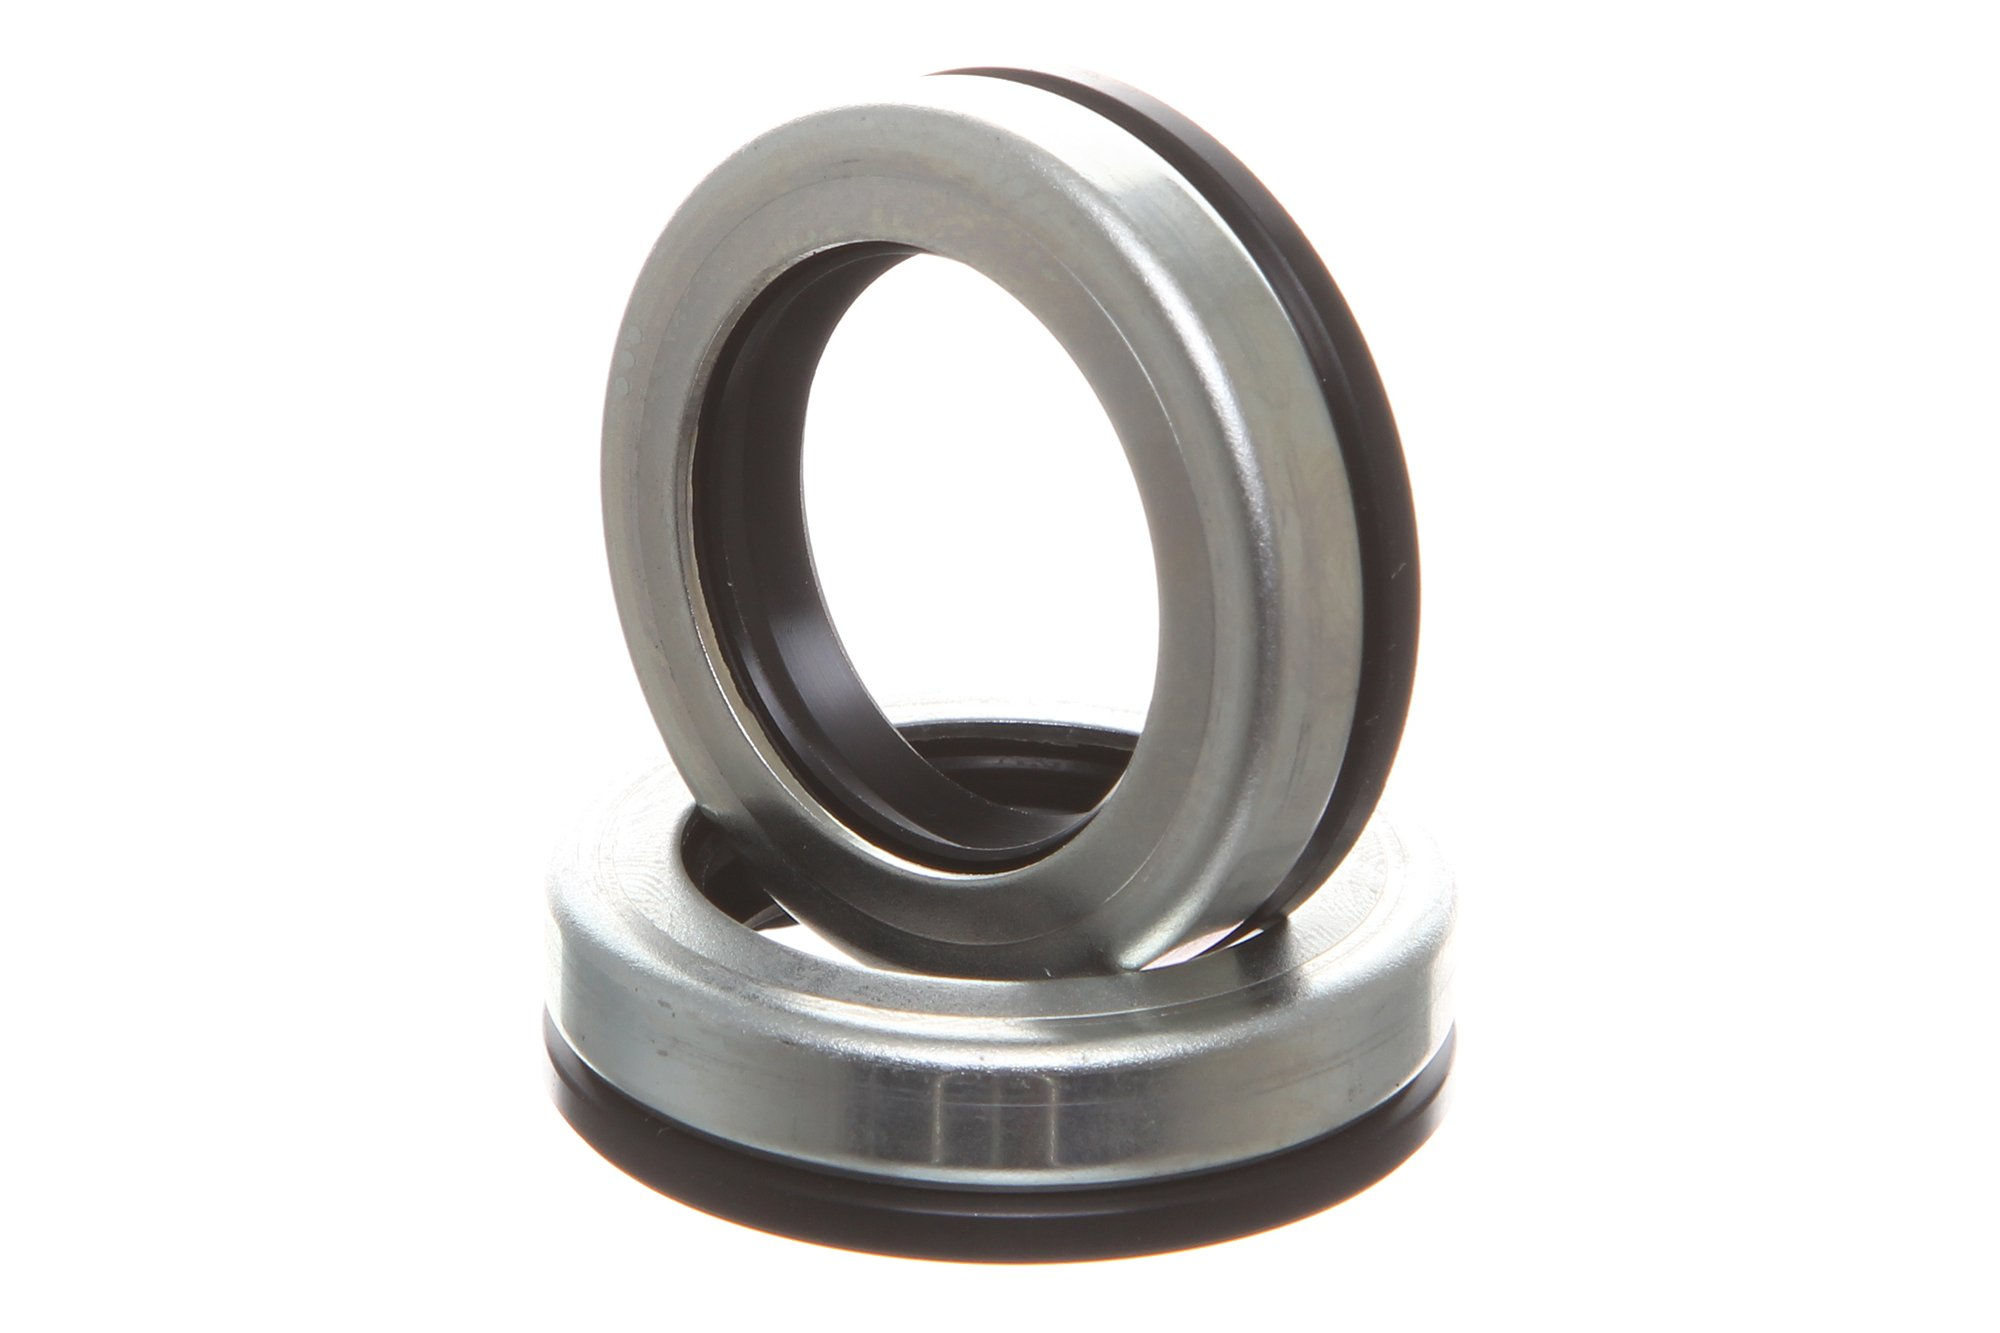 Tiller Tine Seals MTD Bolens Yard Machine Troy-Bilt Replaces 921-04036, 721-04036 & GW-9613 (2 Pack)